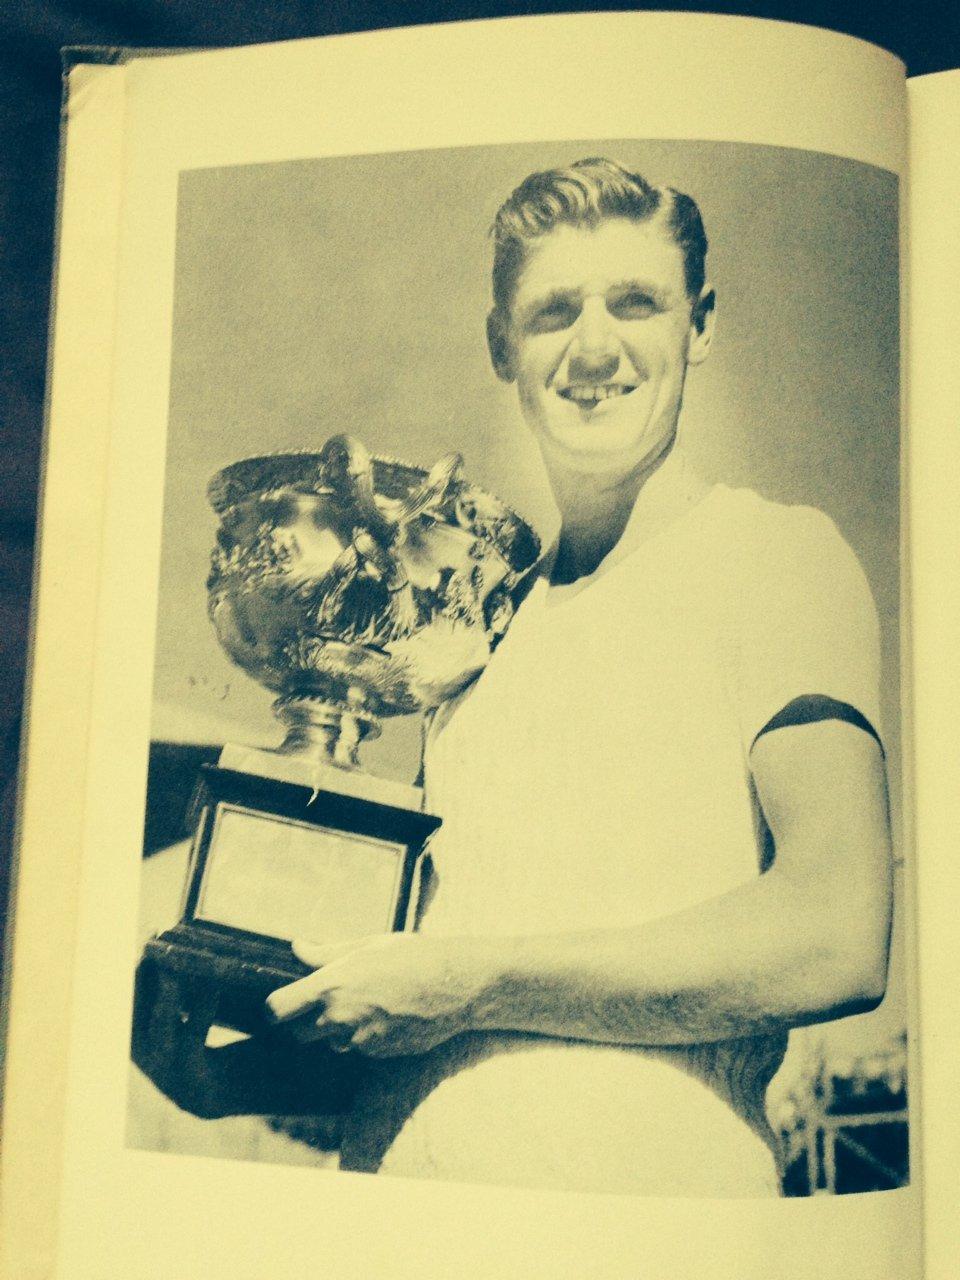 Frank Sedgman s Winning Tennis The Australian Way to a Better Game